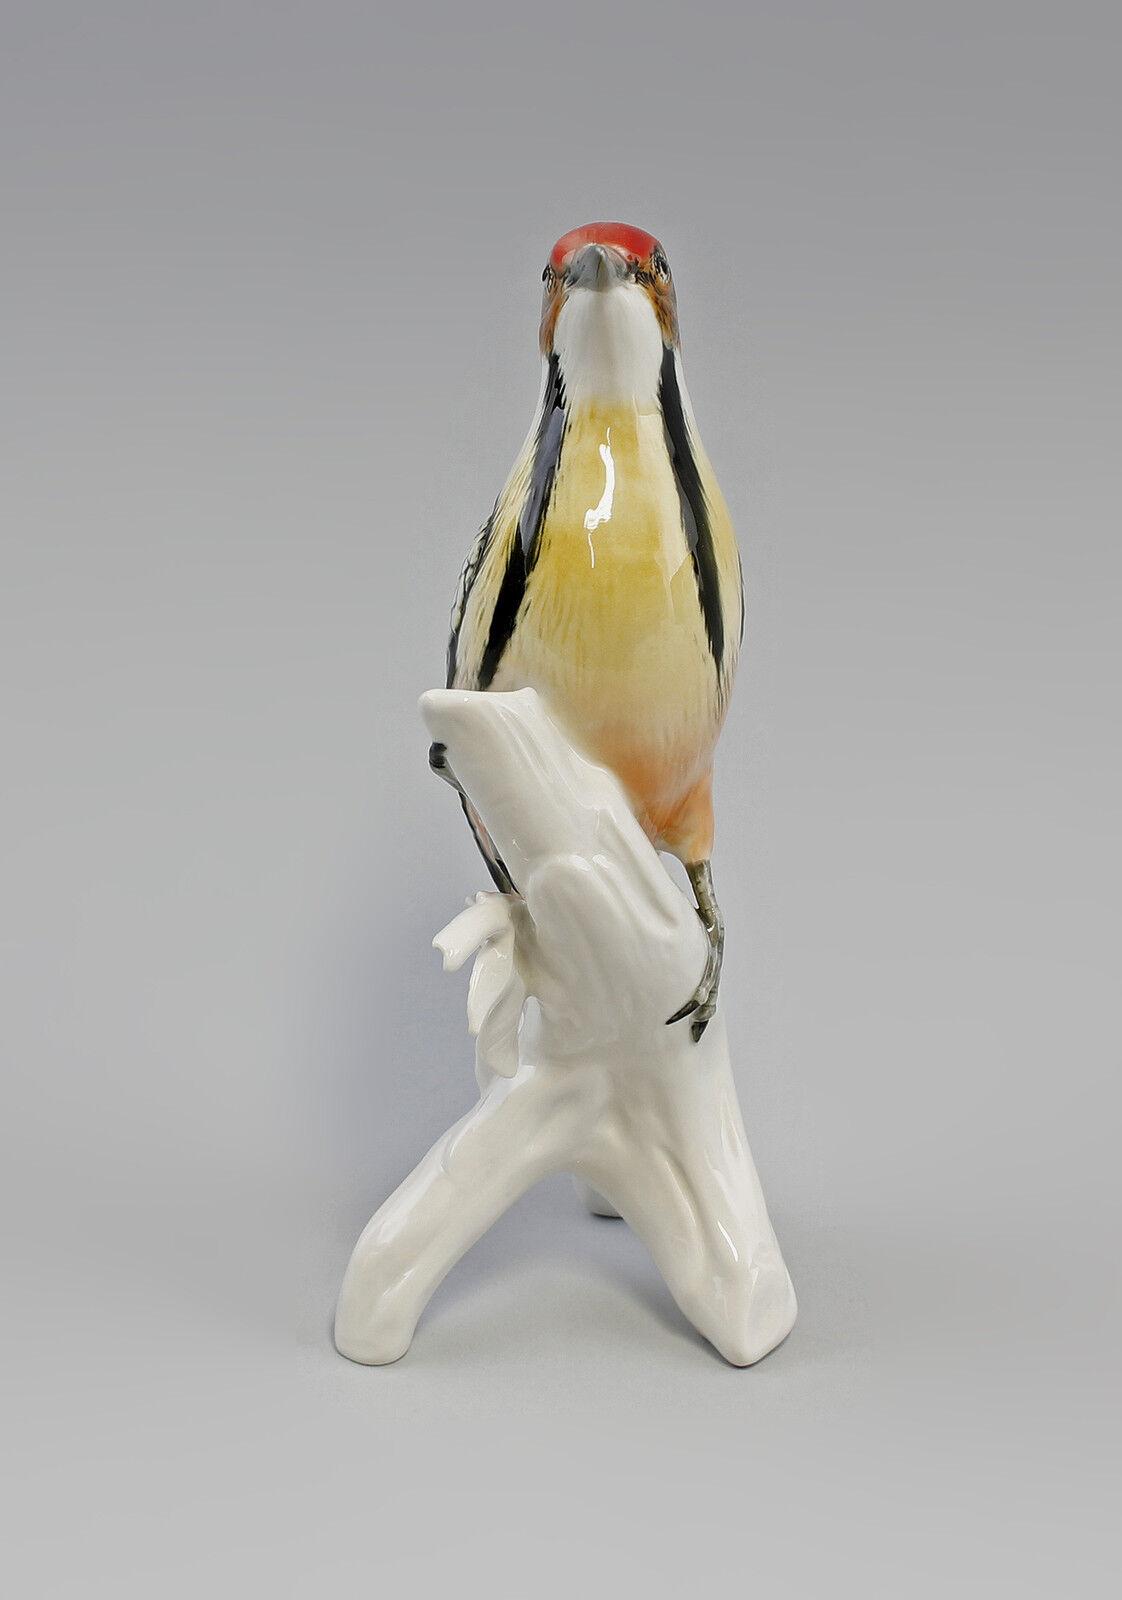 Porzellan Figur Figur Figur Vogel Bunt-Specht Ens H25cm 9941629 b74a47